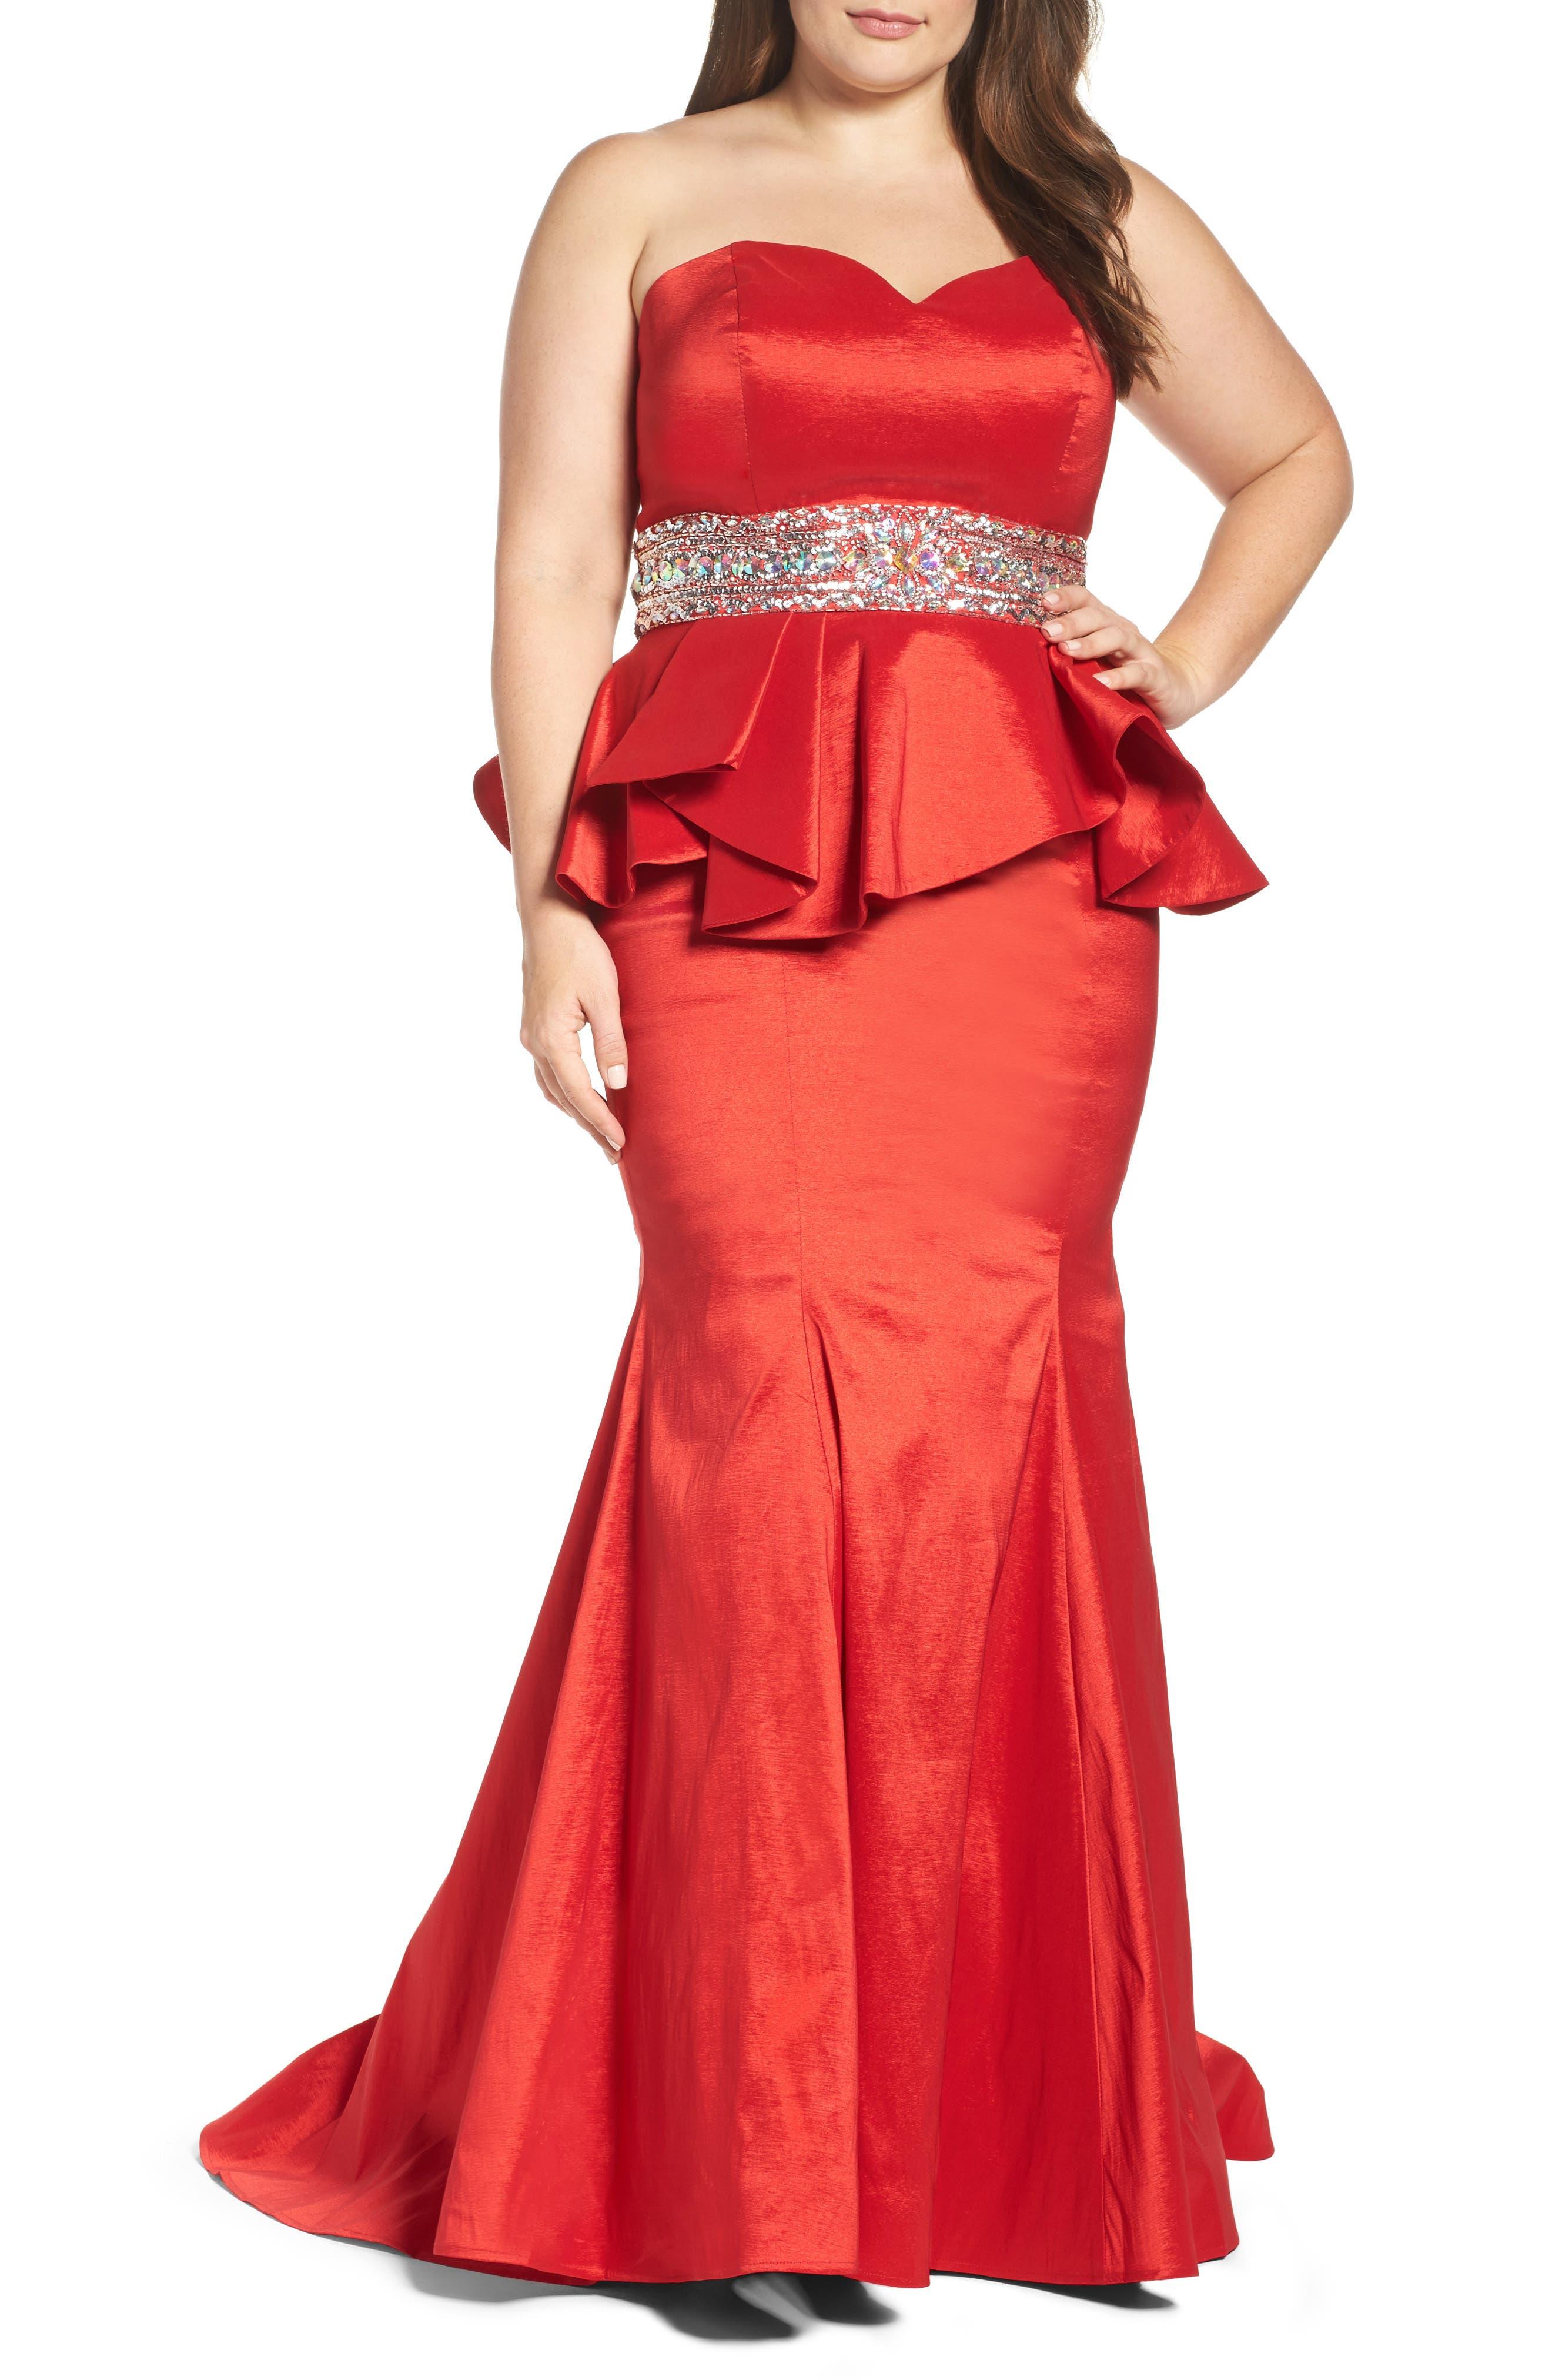 Alternate Image 1 Selected - Mac Duggal Beaded Bustier Peplum Gown (Plus Size)